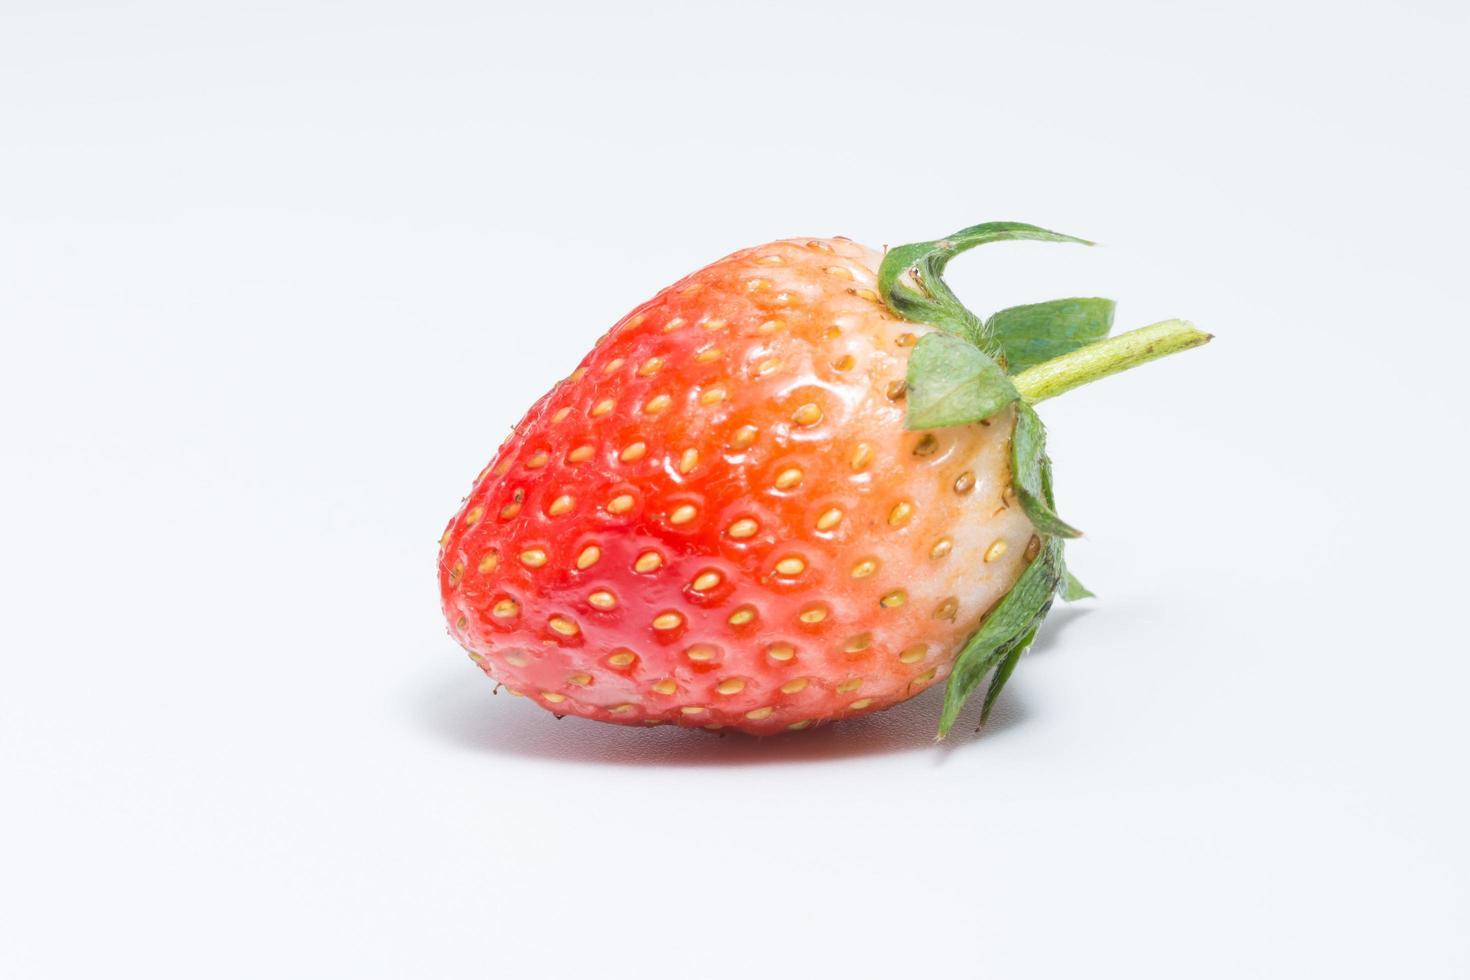 fresa sobre fondo blanco foto